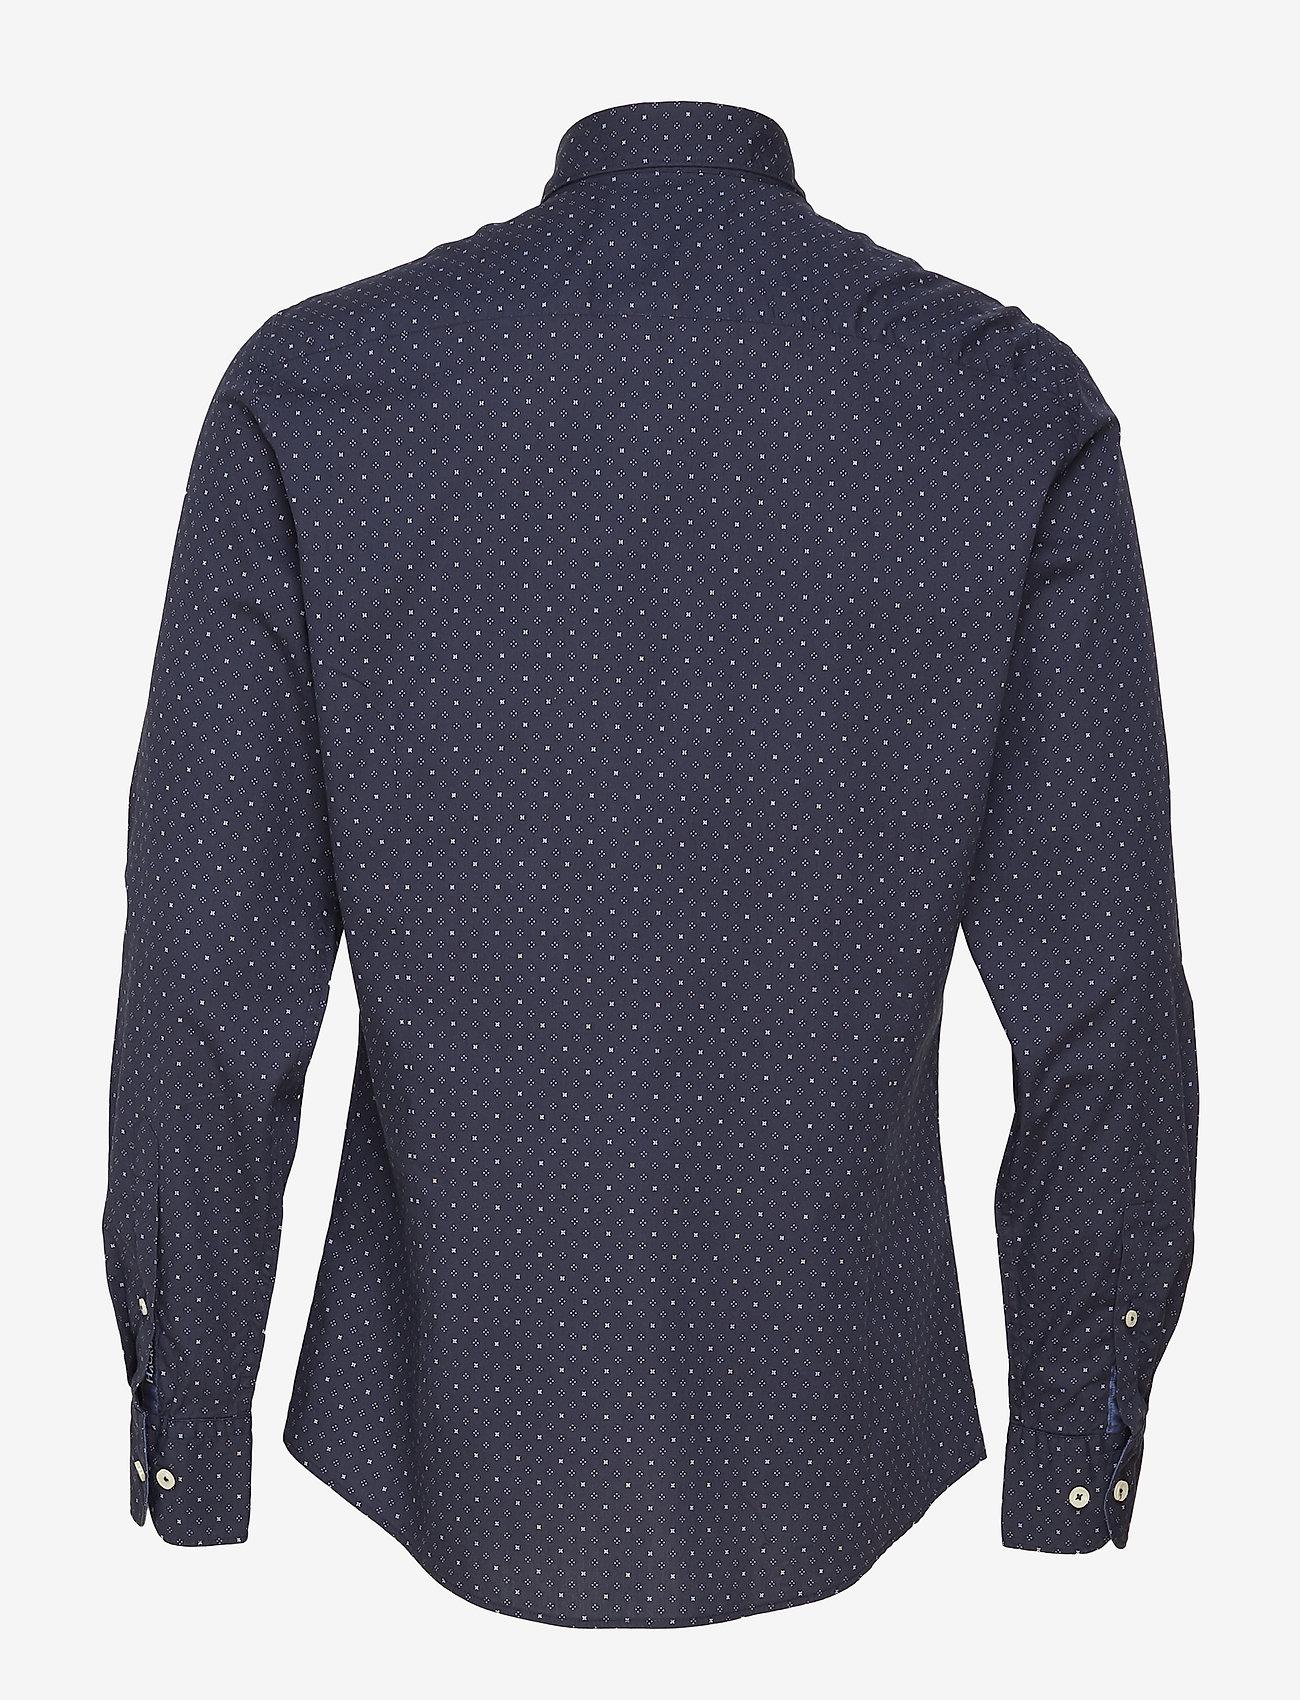 Hackettdots And Crosses Print - Hemden